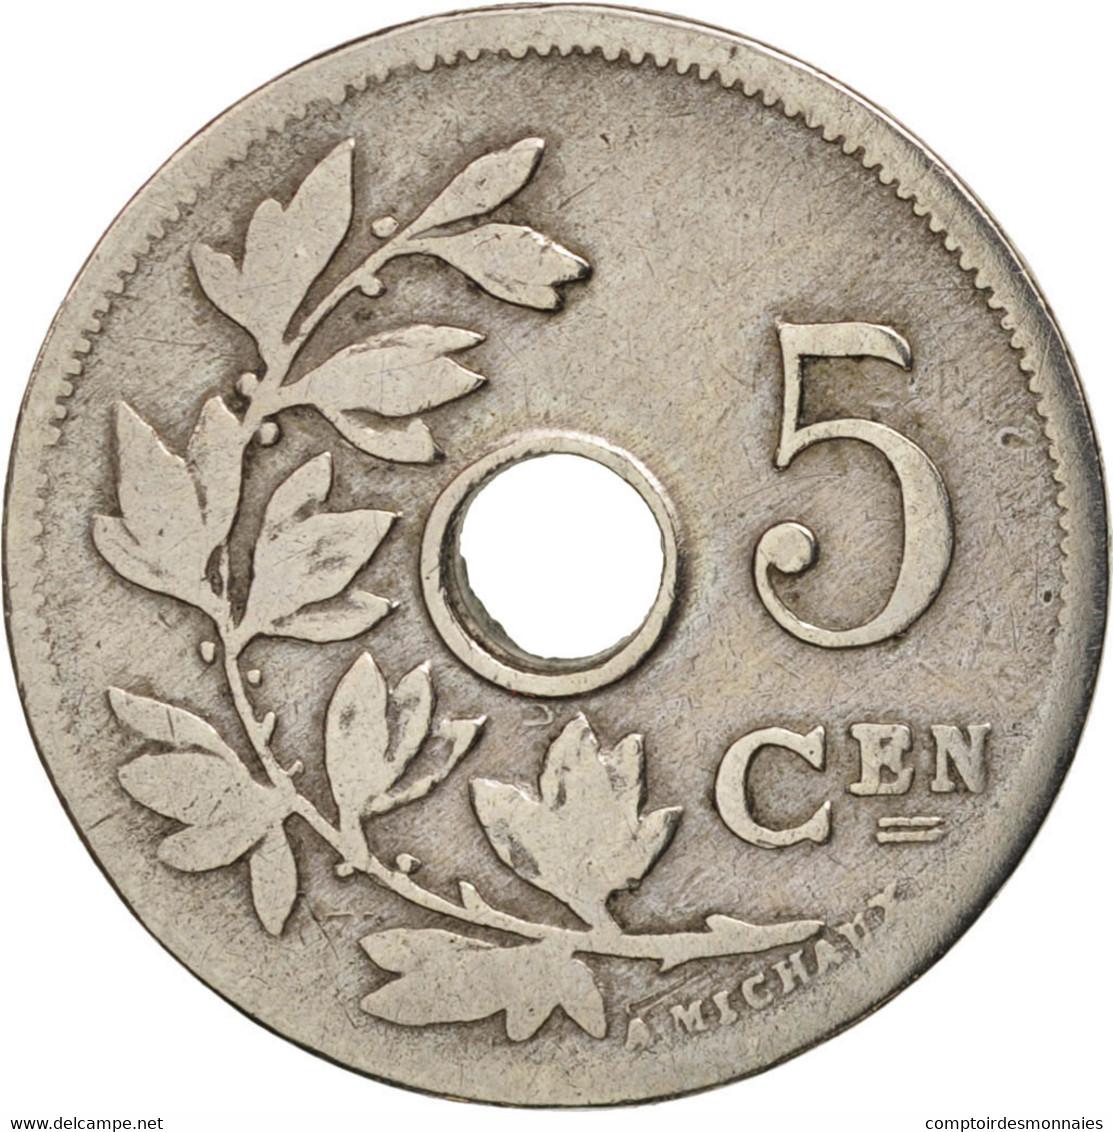 Belgique, 5 Centimes, 1904, TB+, Copper-nickel, KM:55 - 03. 5 Centimes